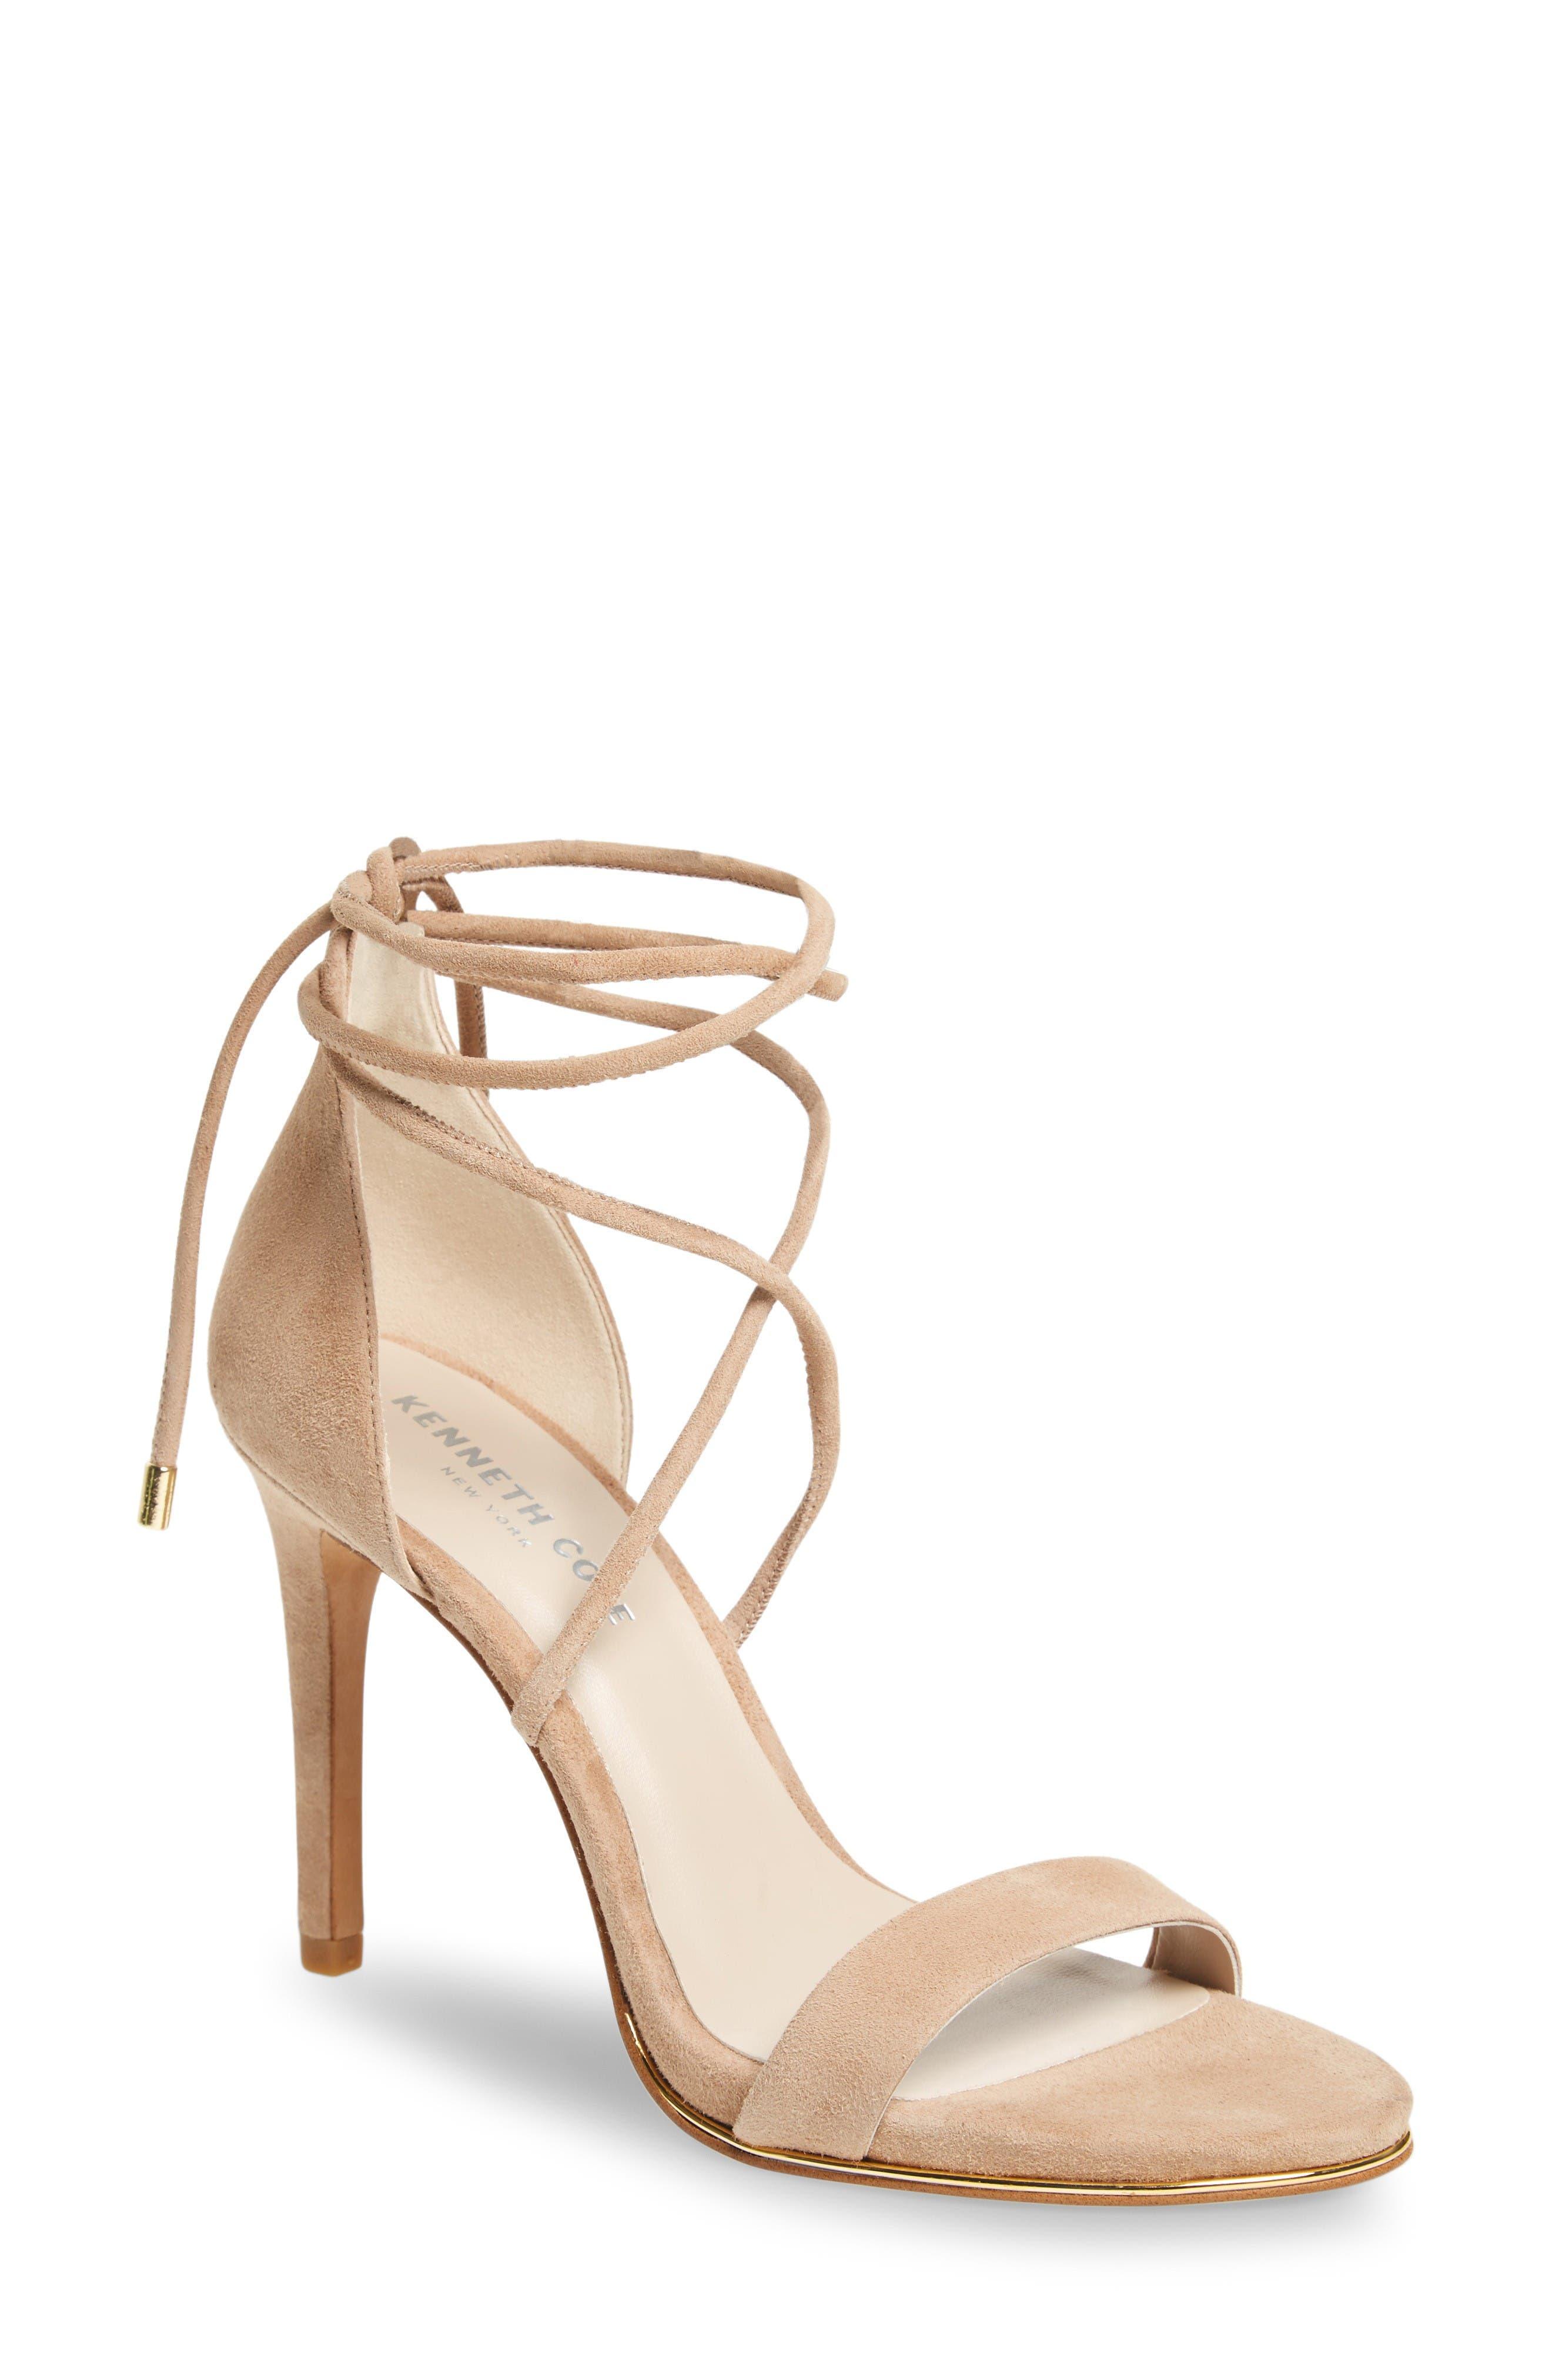 KENNETH COLE NEW YORK Berry Wraparound Sandal